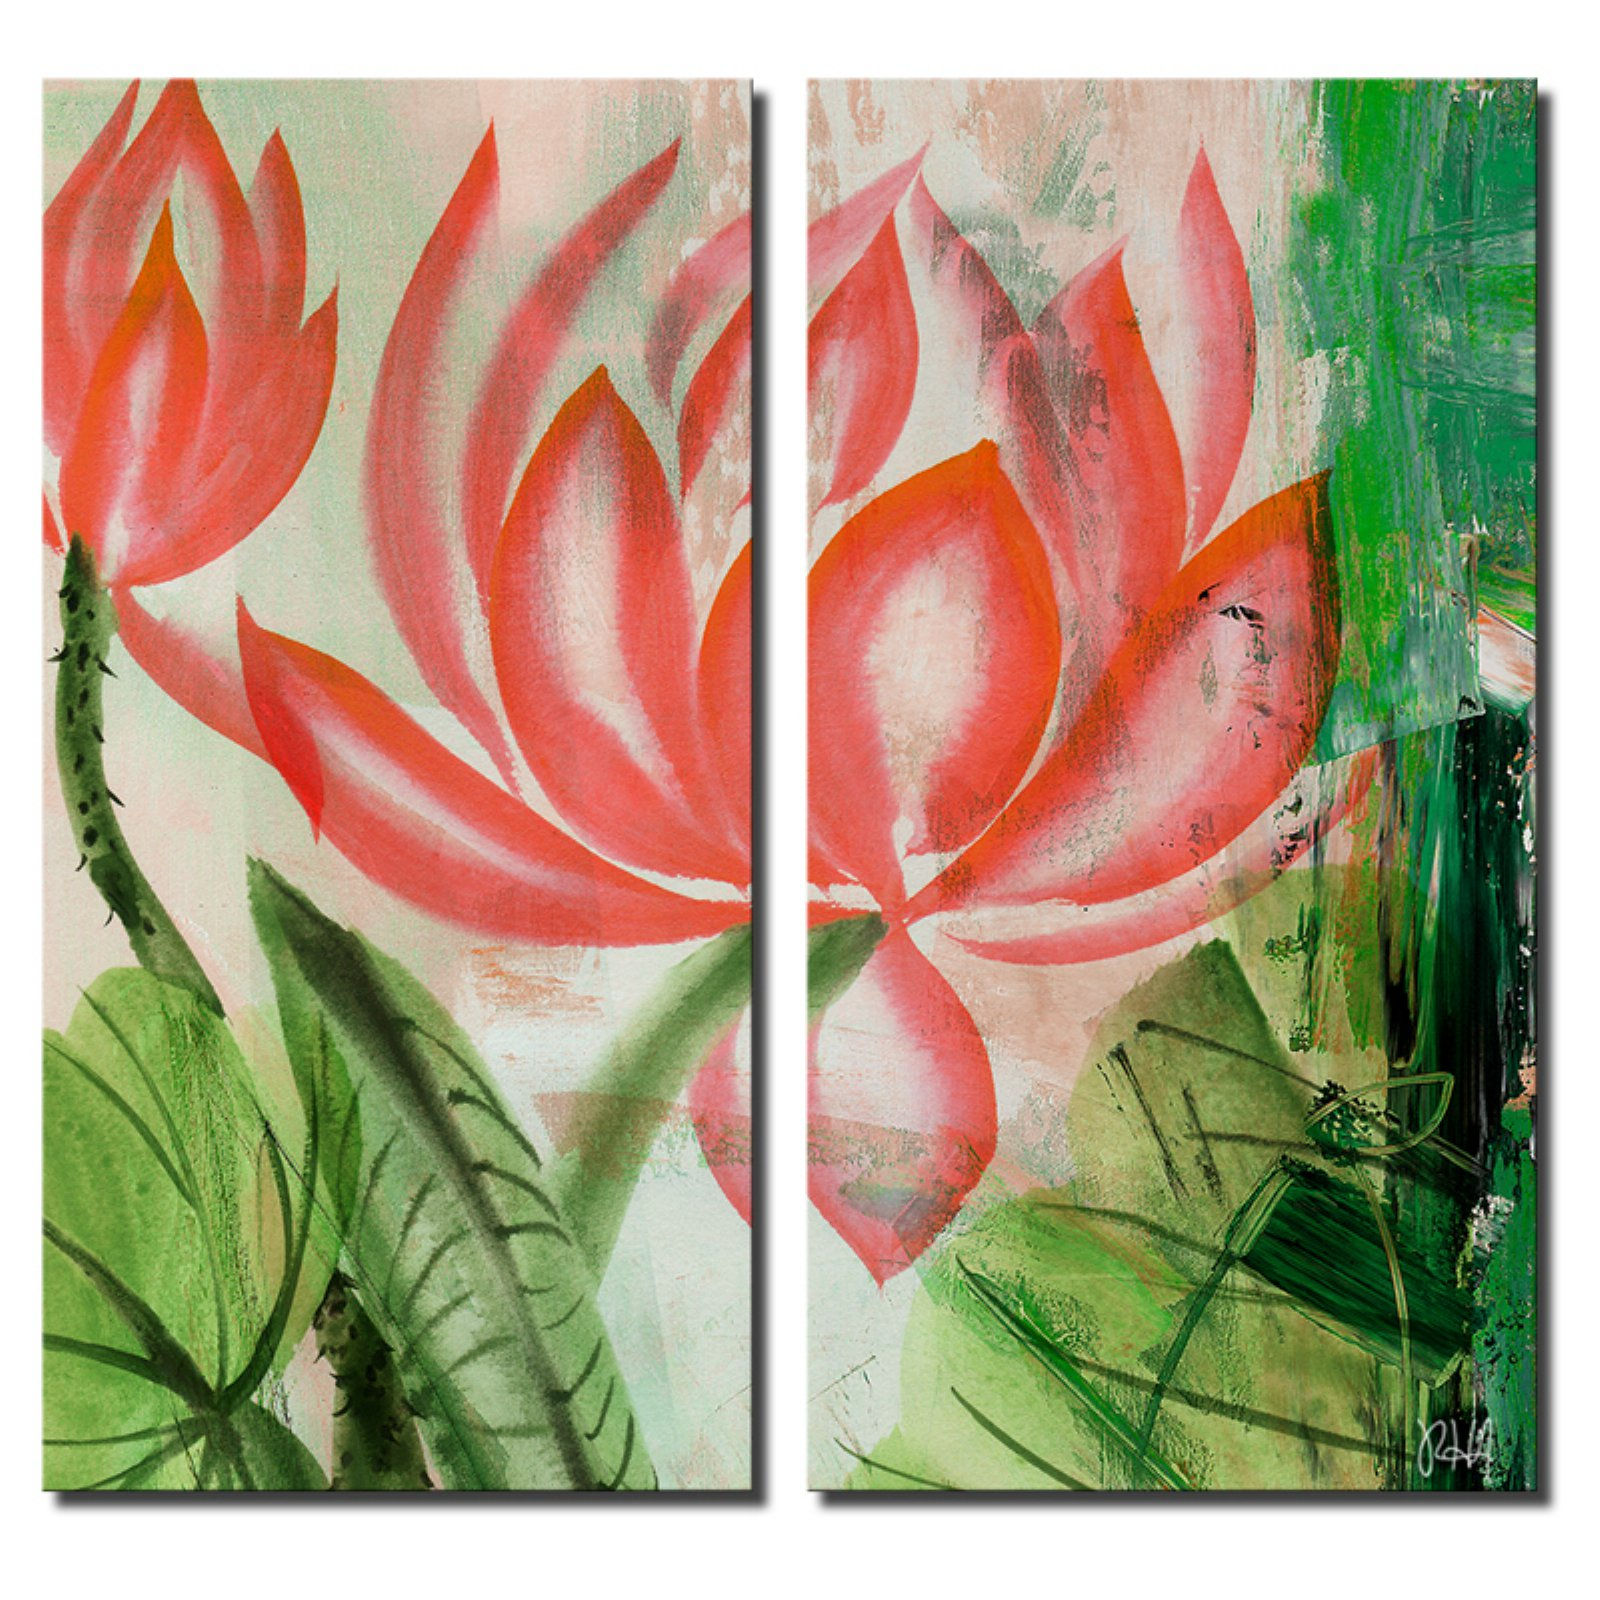 Ready2HangArt Painted Petals LIII Canvas Wall Art - 2 pc. Set